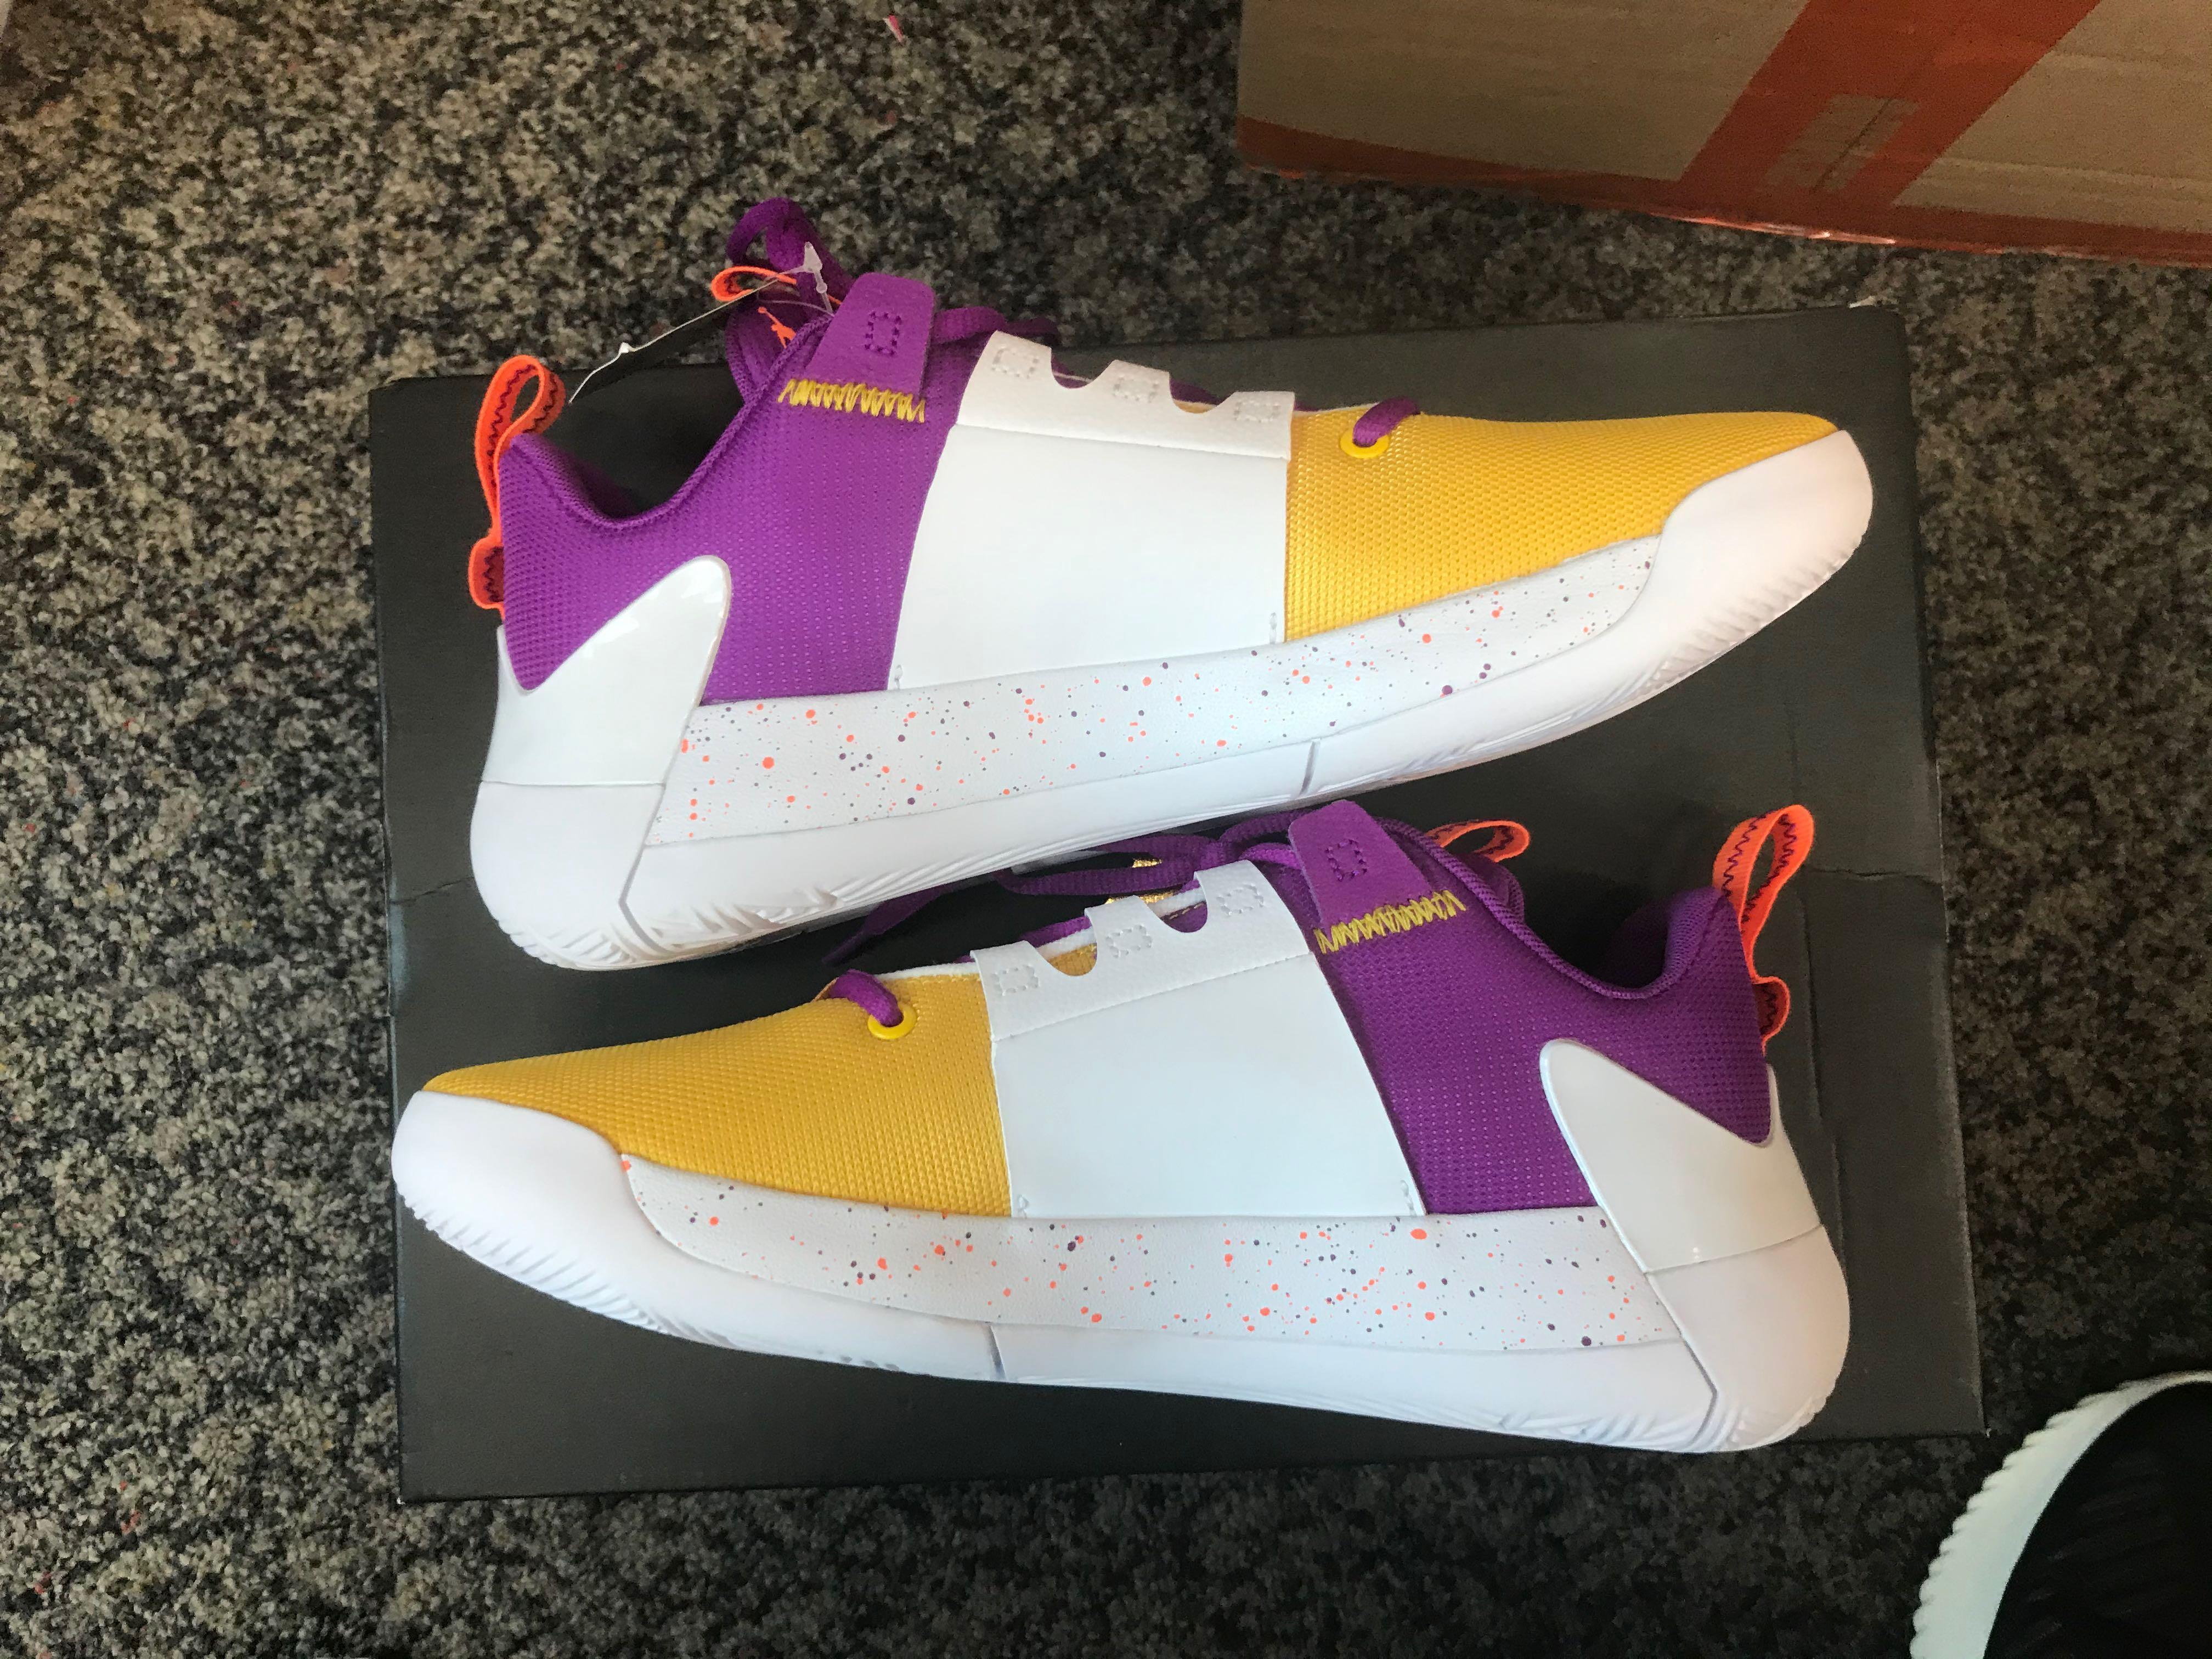 Nike Jordan Zoom Zero Gravity US7.5